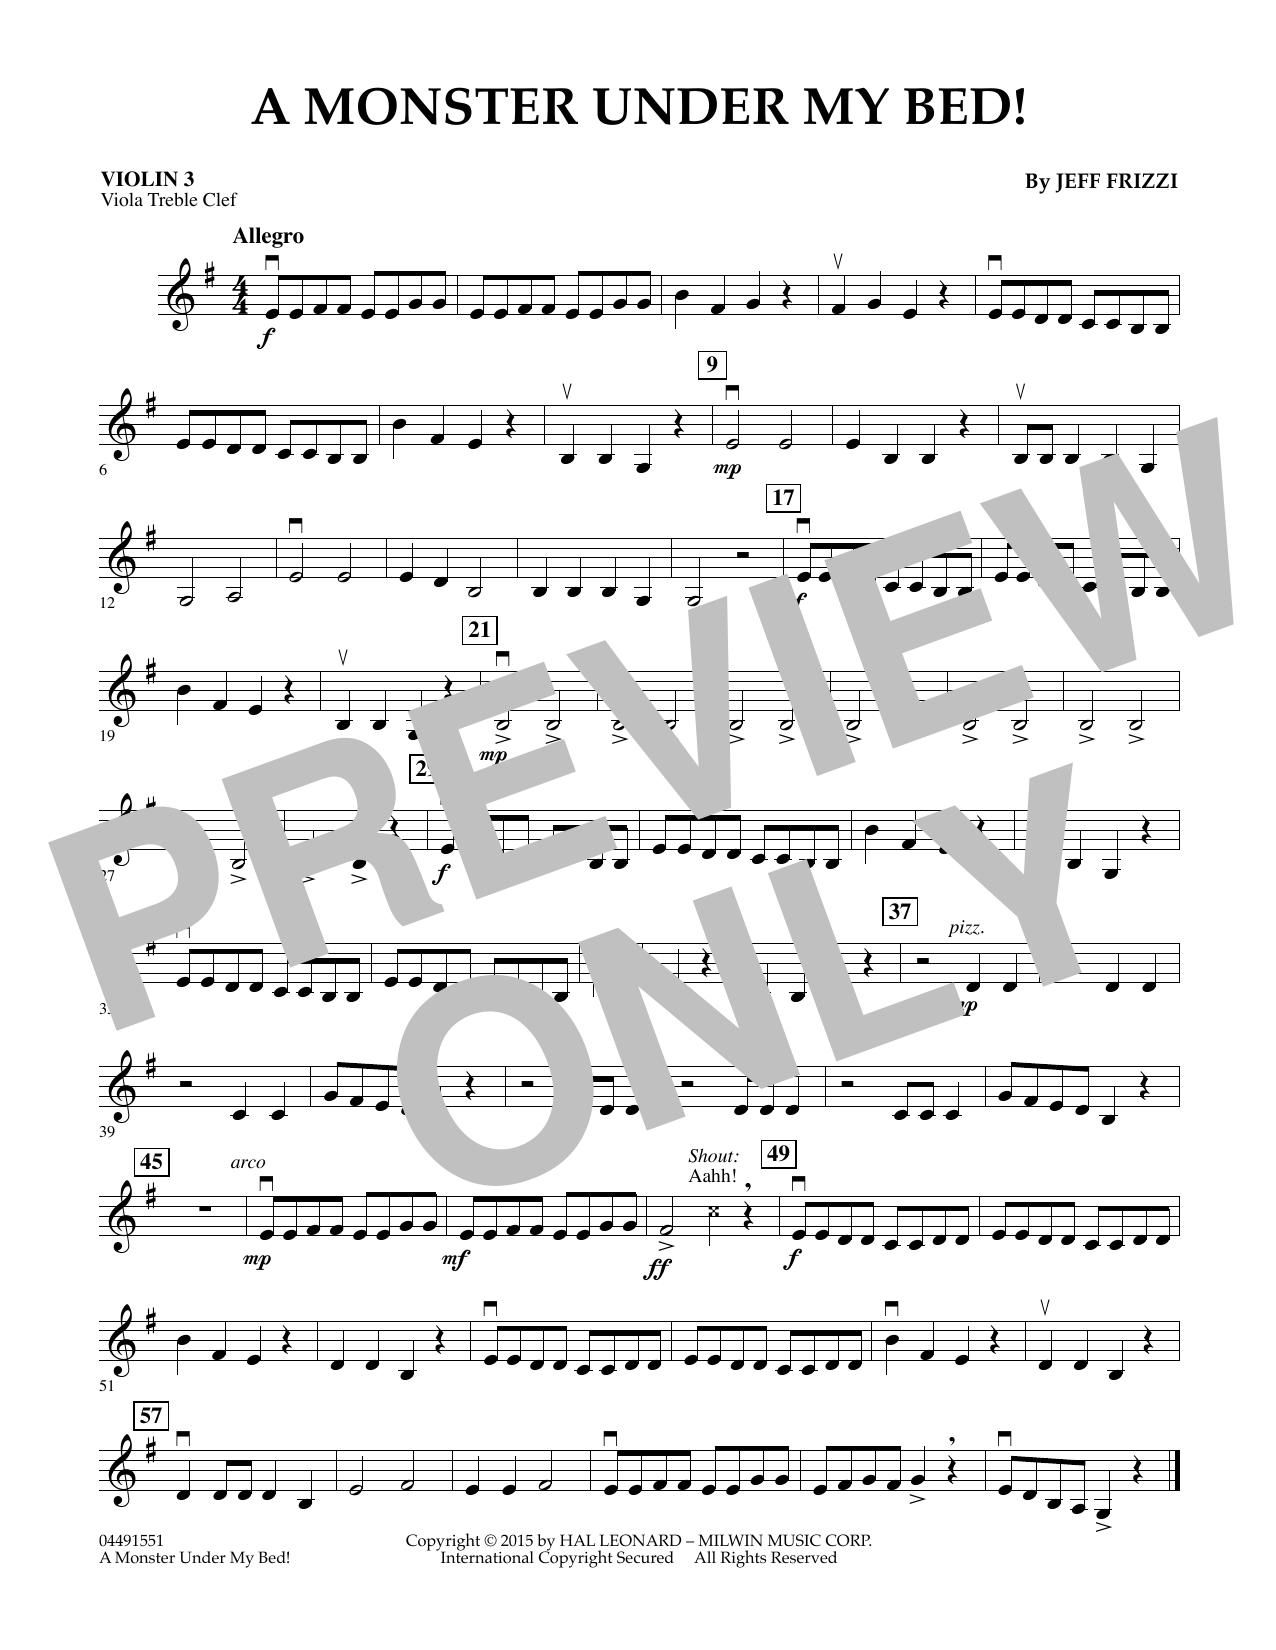 A Monster Under My Bed! - Violin 3 (Viola Treble Clef) (Orchestra)